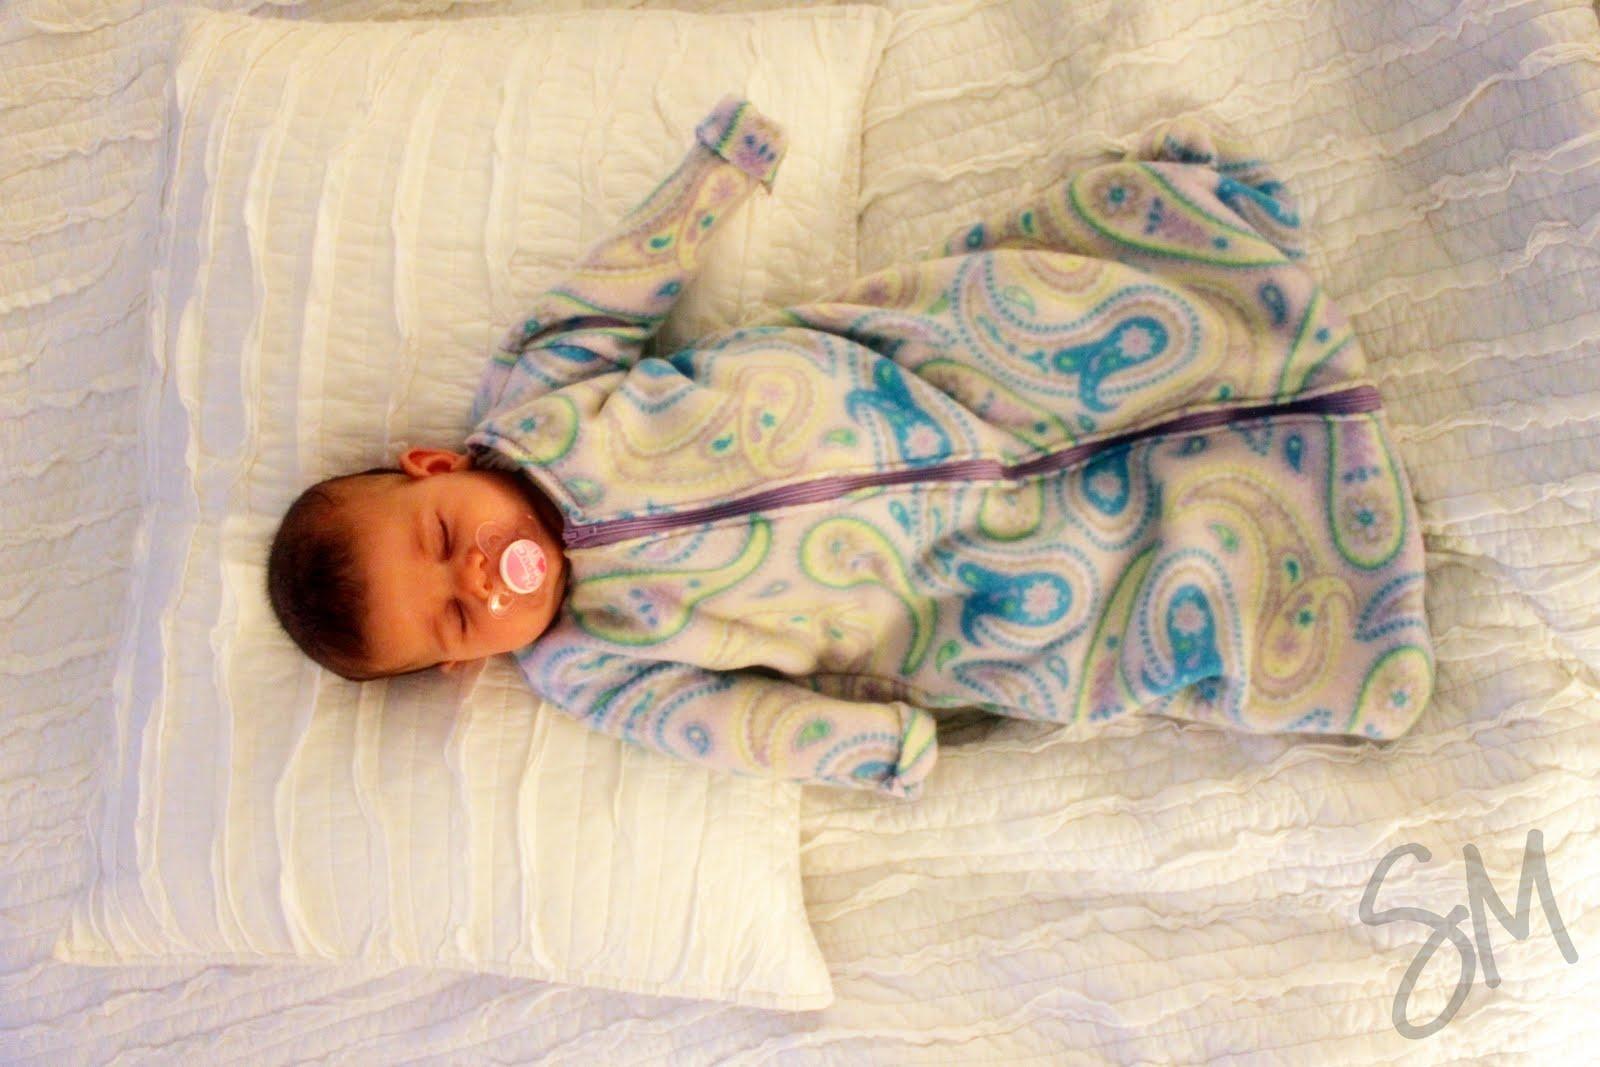 Ann Sacks Diy Sleepsack Hurray Sleep